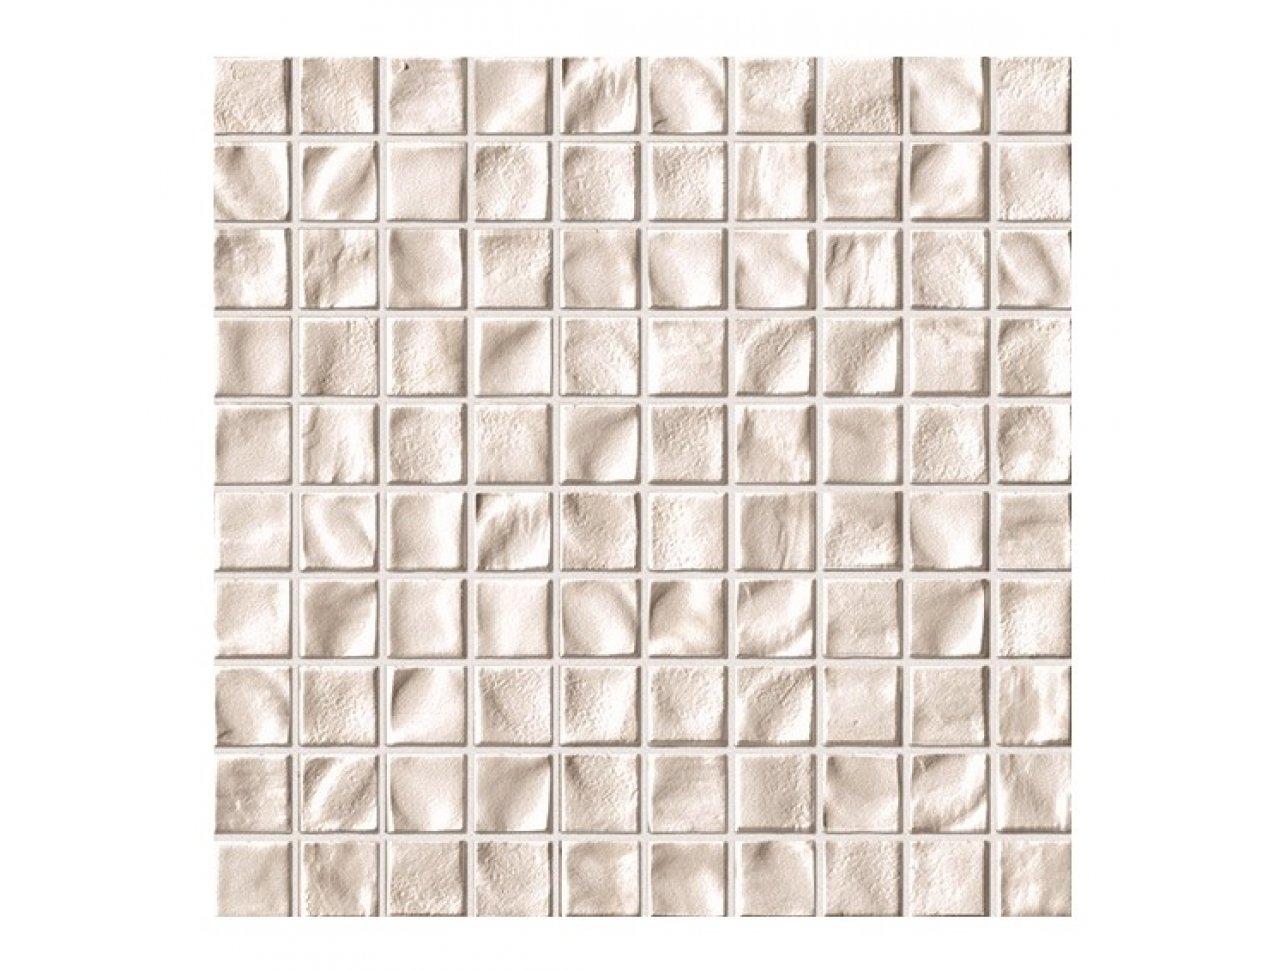 Мозаика FAP Roma Natura Calacatta Mosaico 30.5 x 30.5 см, Арт. fLTH